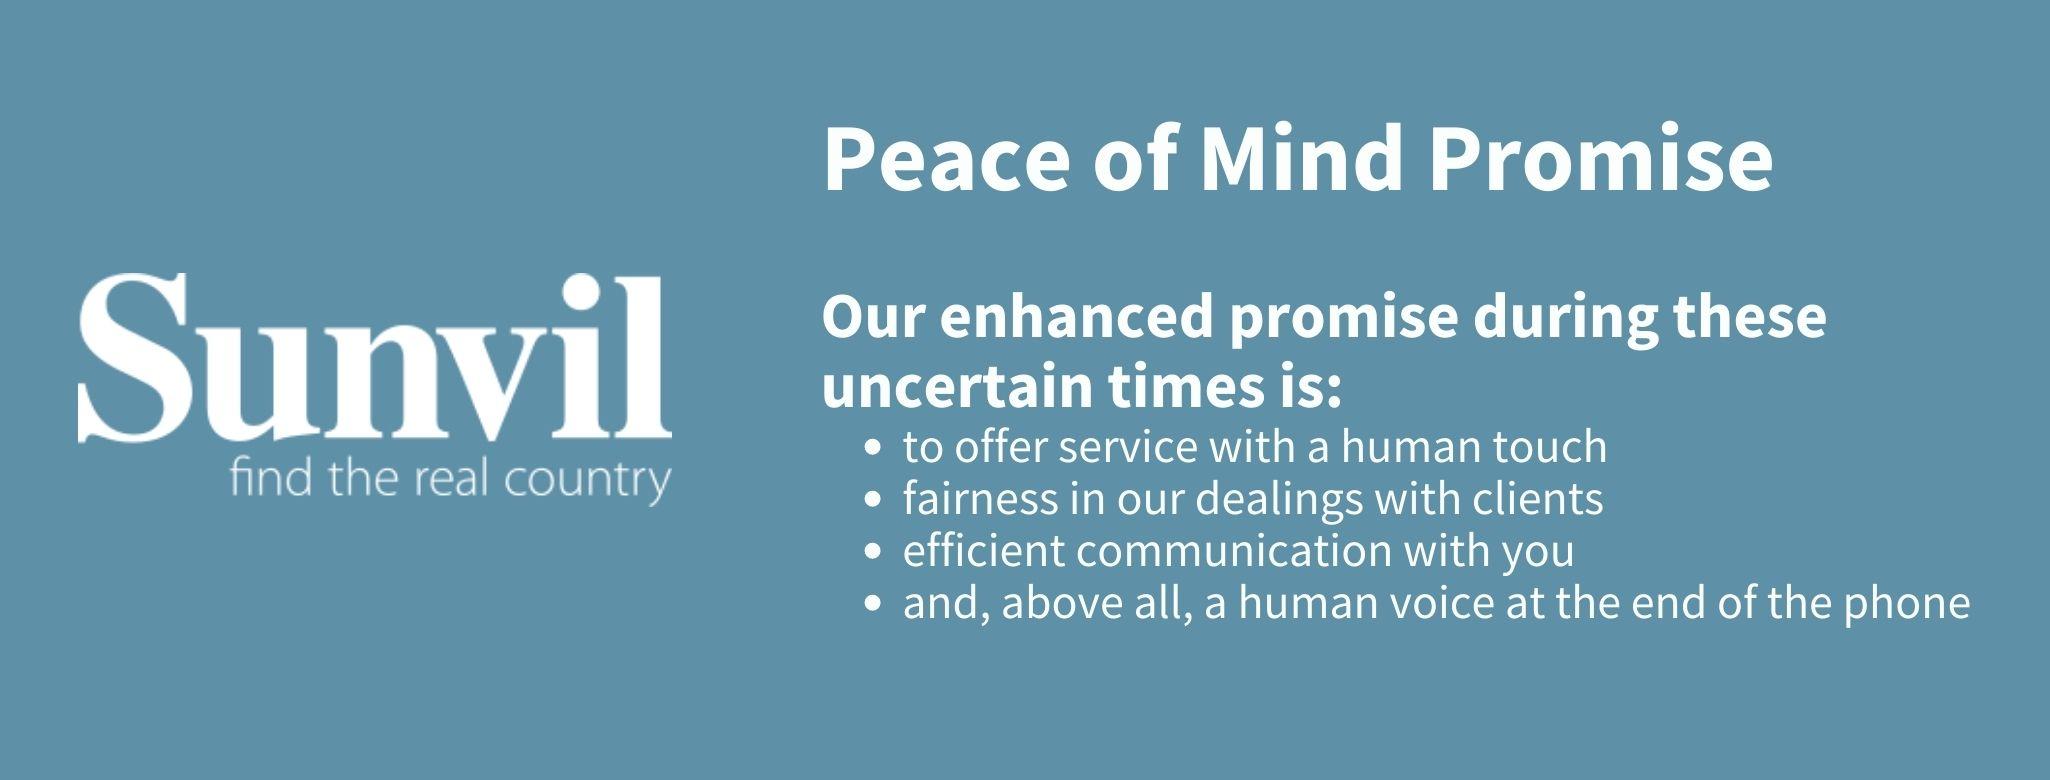 Peace of mind promise